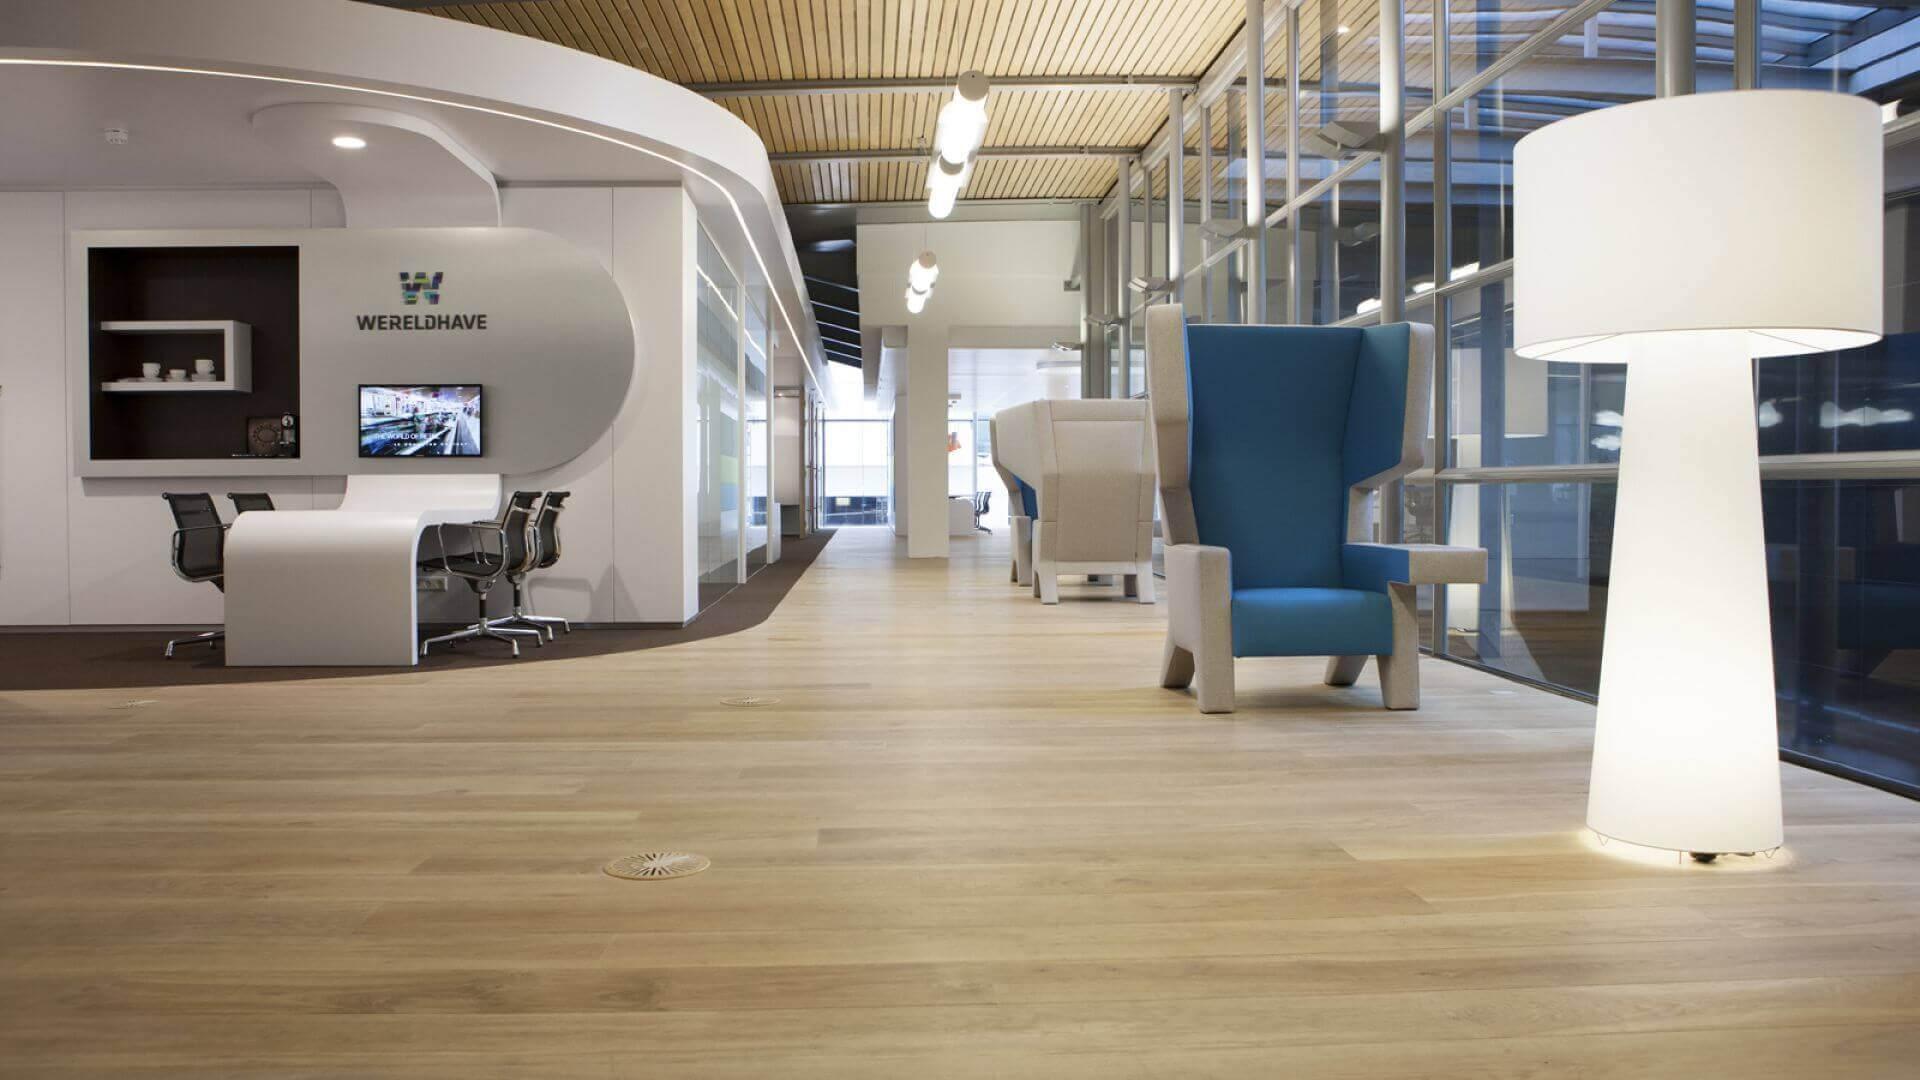 wood flooring wtc schiphol airport amsterdam